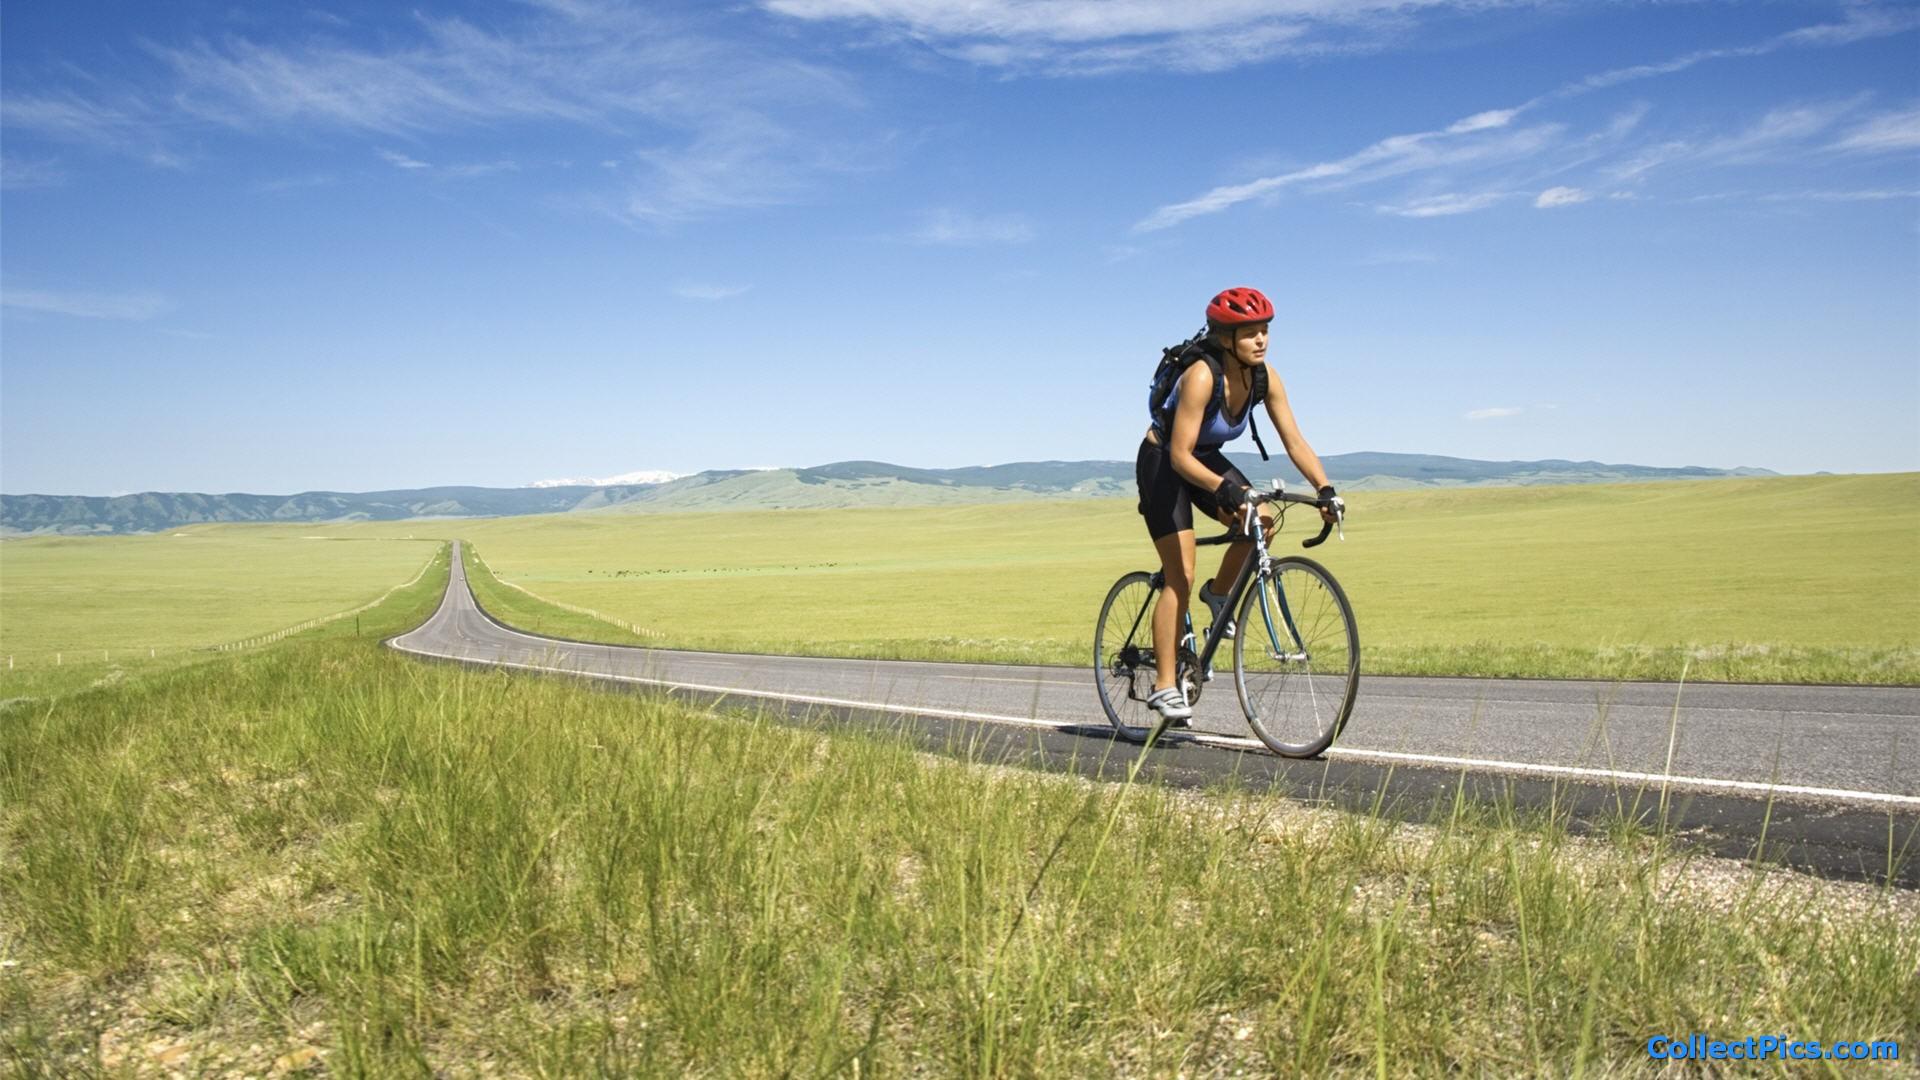 Road Bike Wallpaper